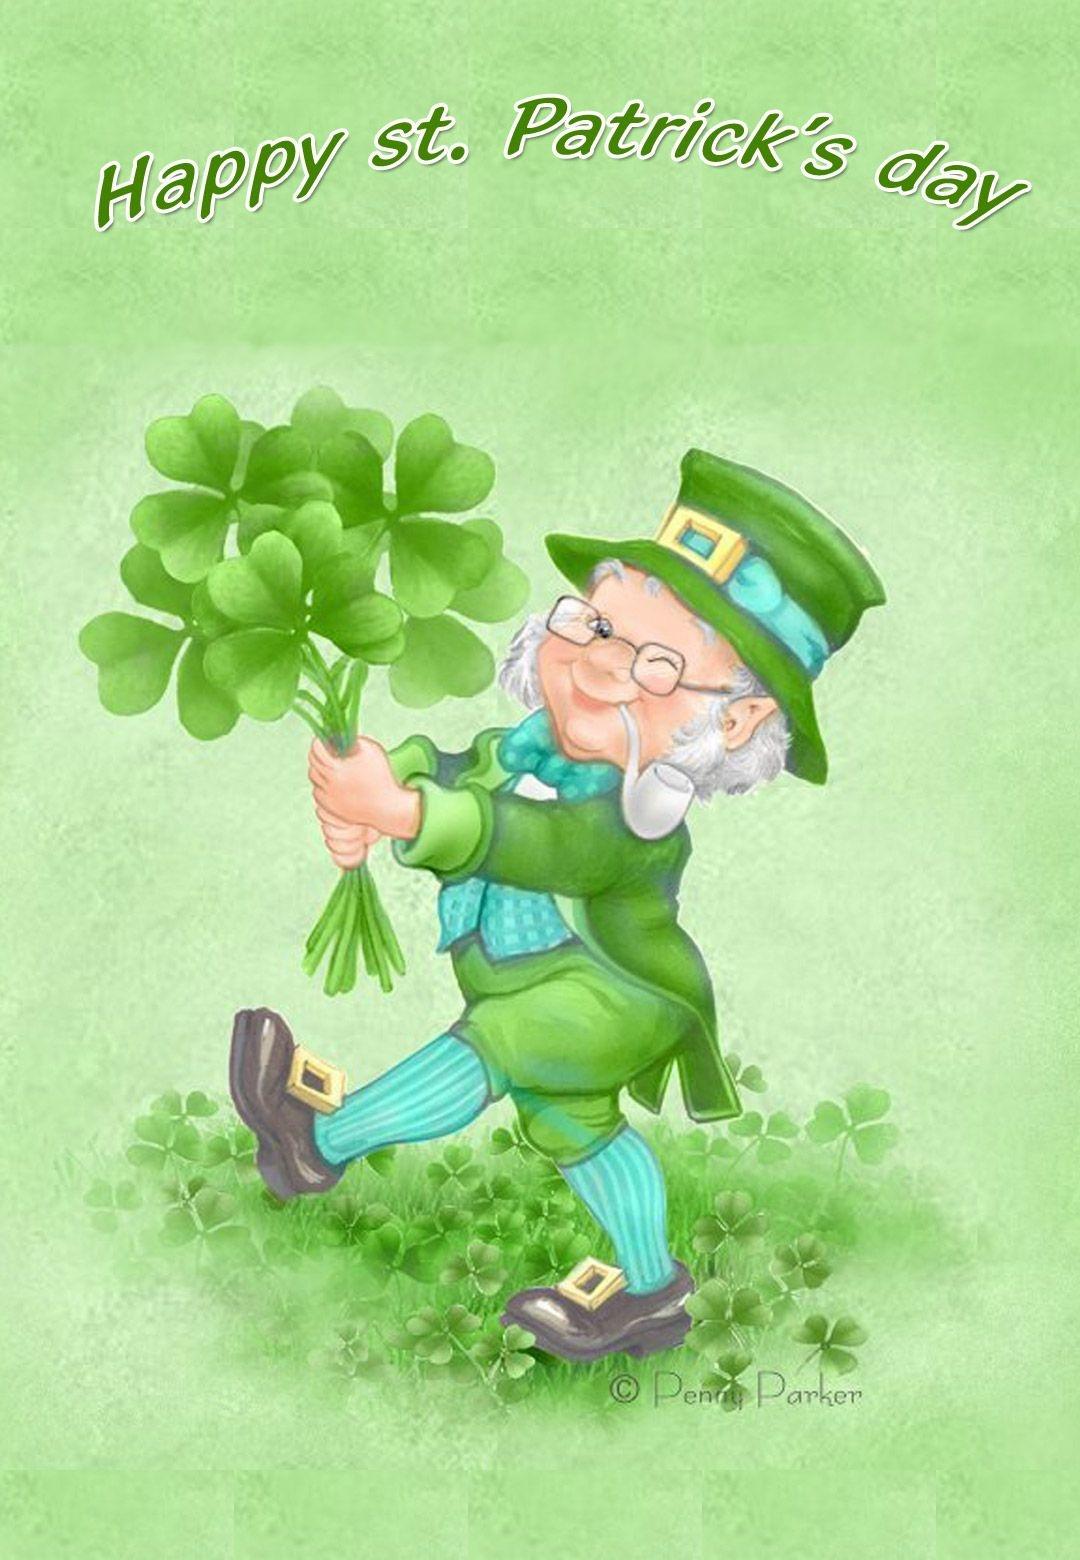 Free Printable Happy St Patricks Day Greeting Card | Printable St - Free Printable St Patrick's Day Greeting Cards